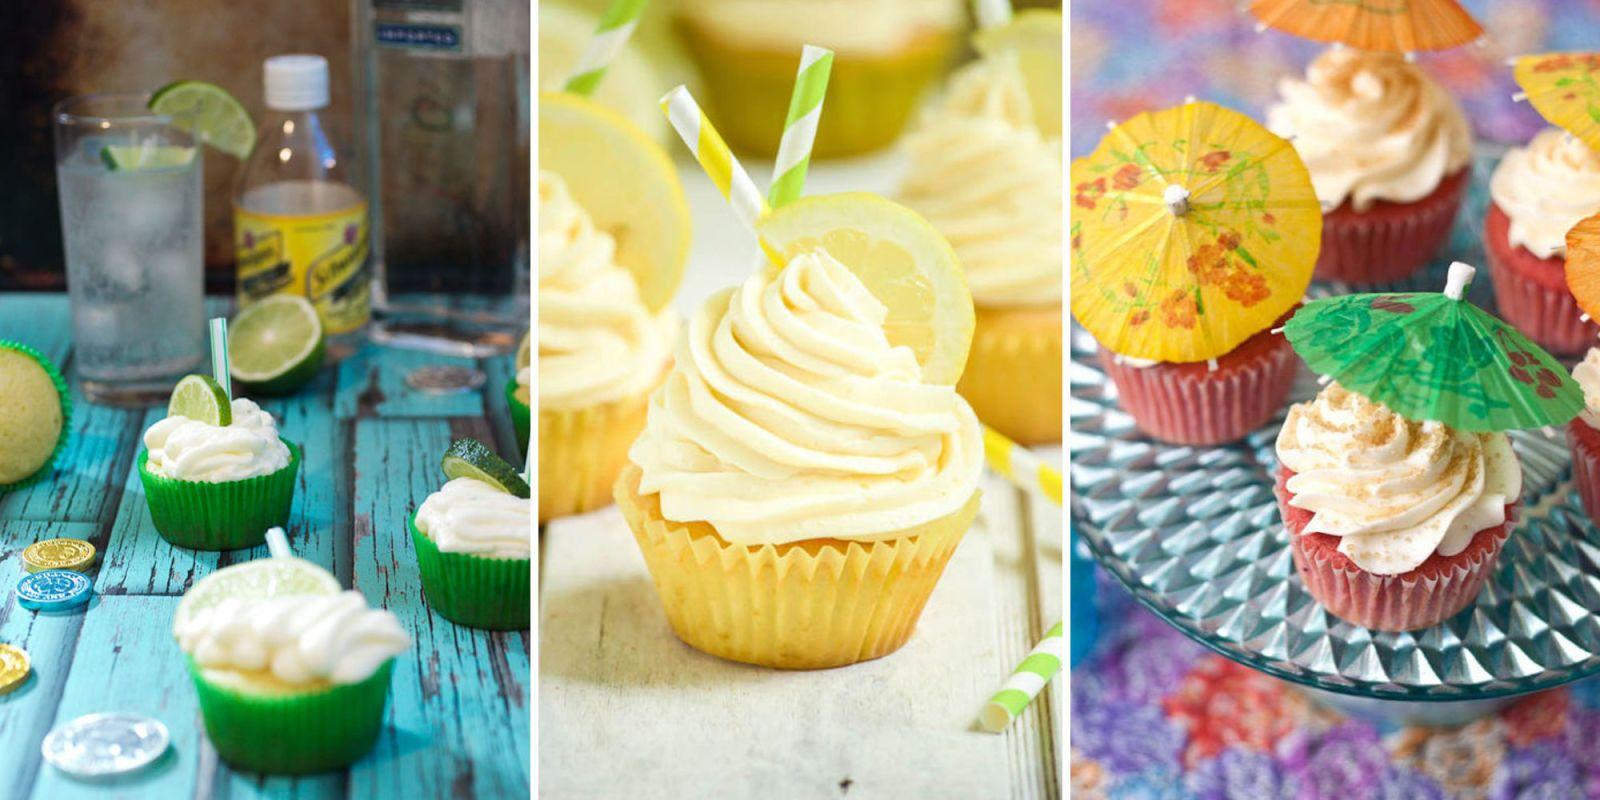 Recipes For Boozy Cupcakes